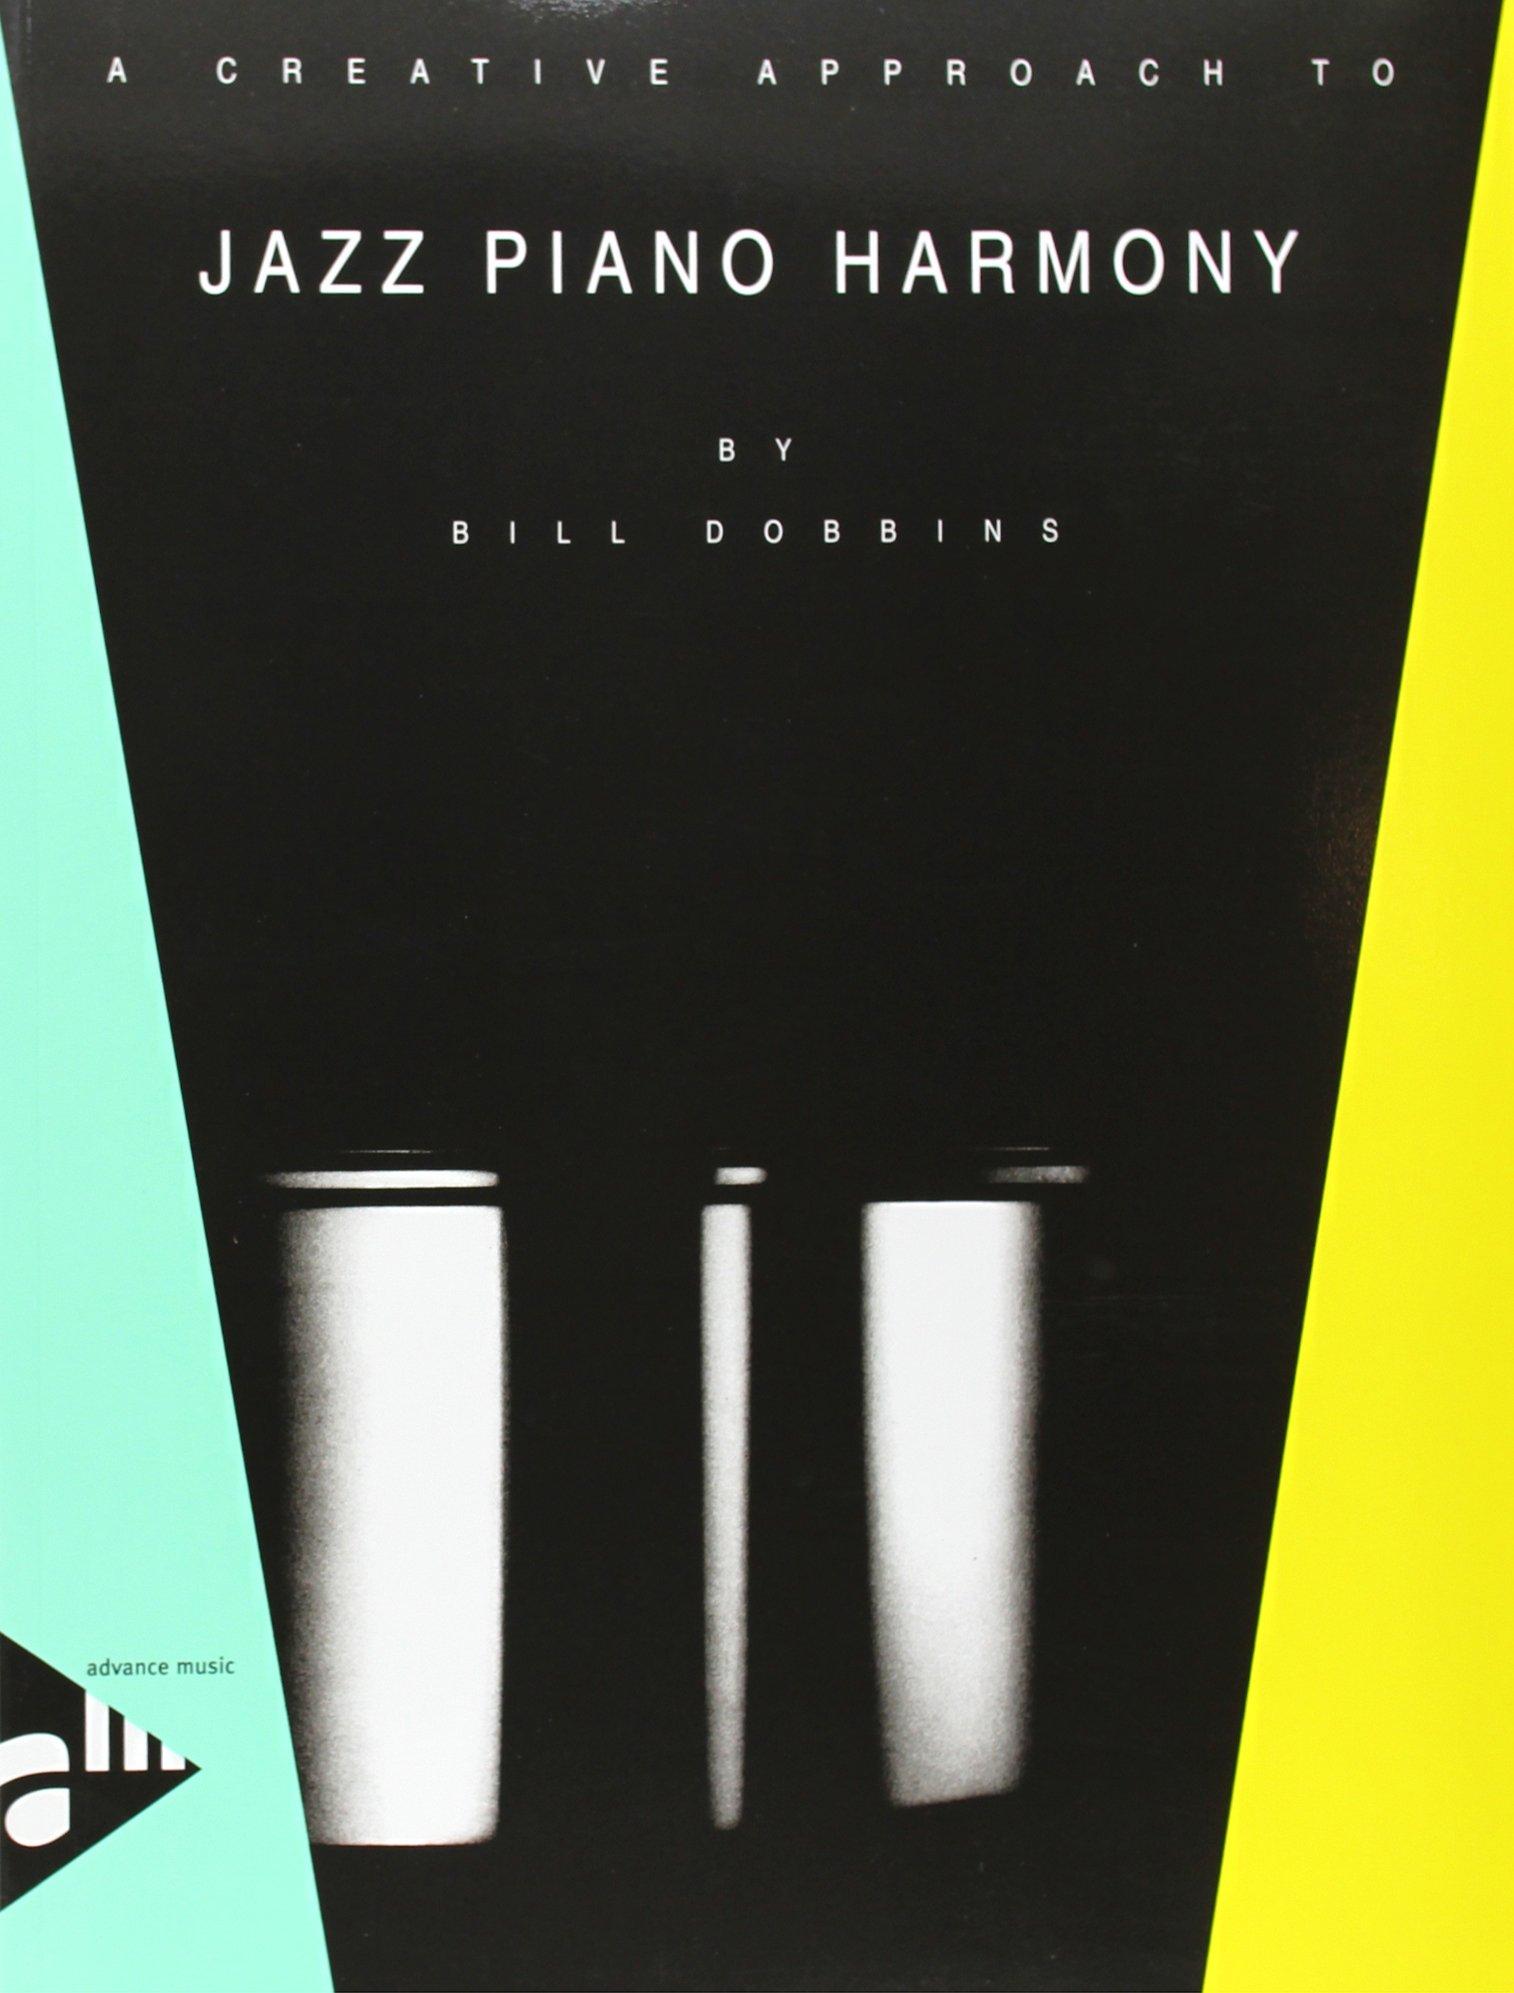 Partition jazz&blue ADVANCE MUSIC DOBBINS B. - A CREATIVE APPROACH TO JAZZ PIANO HARMONY - PIANO Piano Paperback – 1659 Bill Dobbins 0206309341